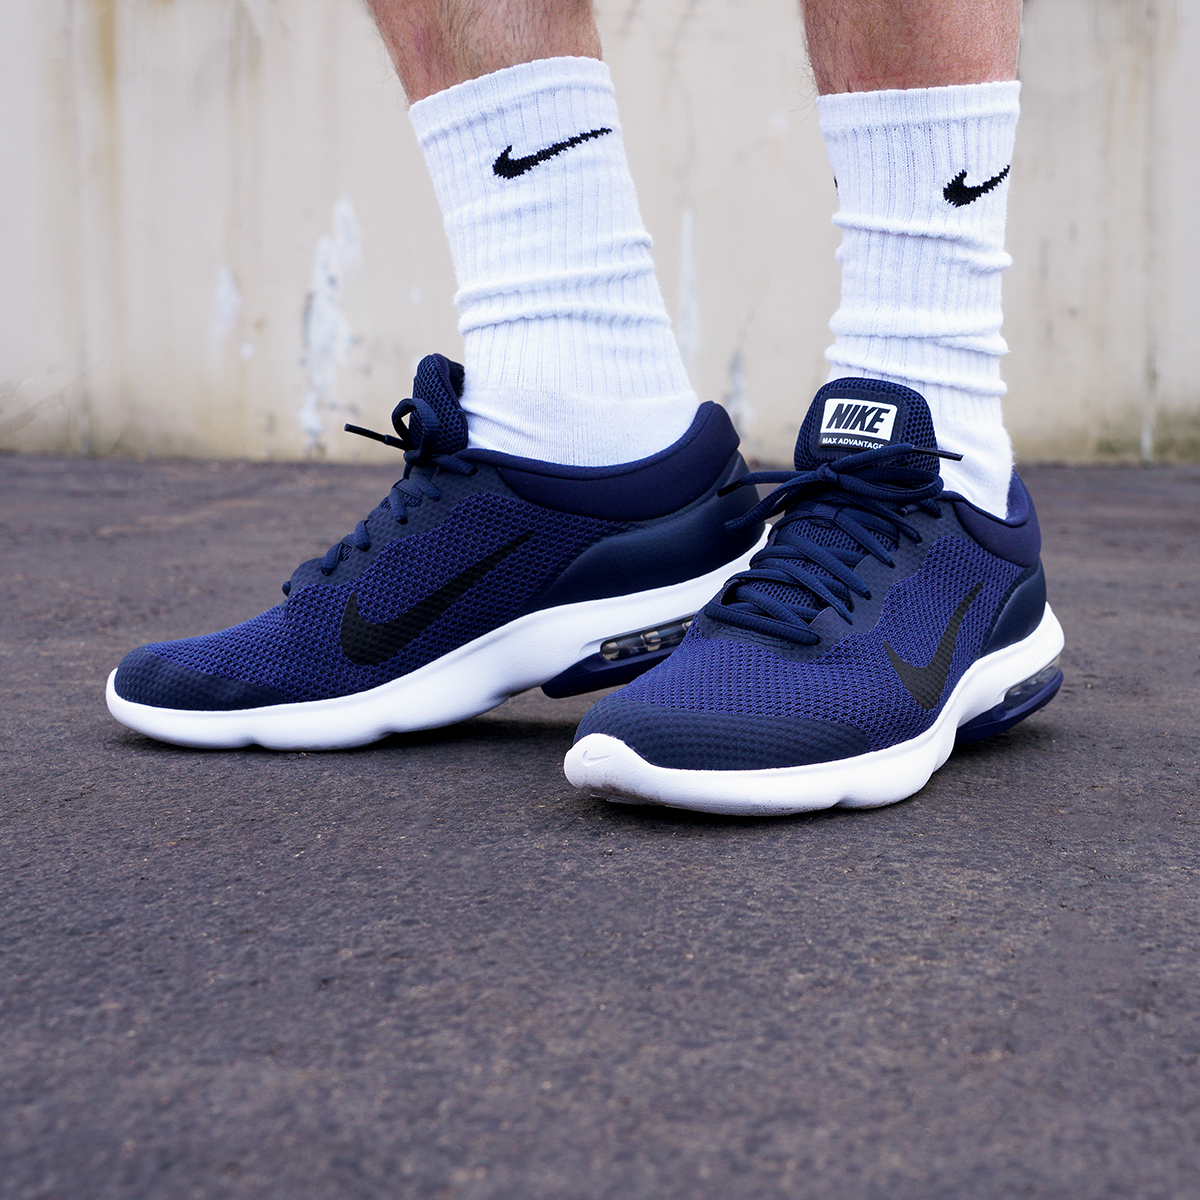 Nike Men's Air Max Advantage 3 Shoes